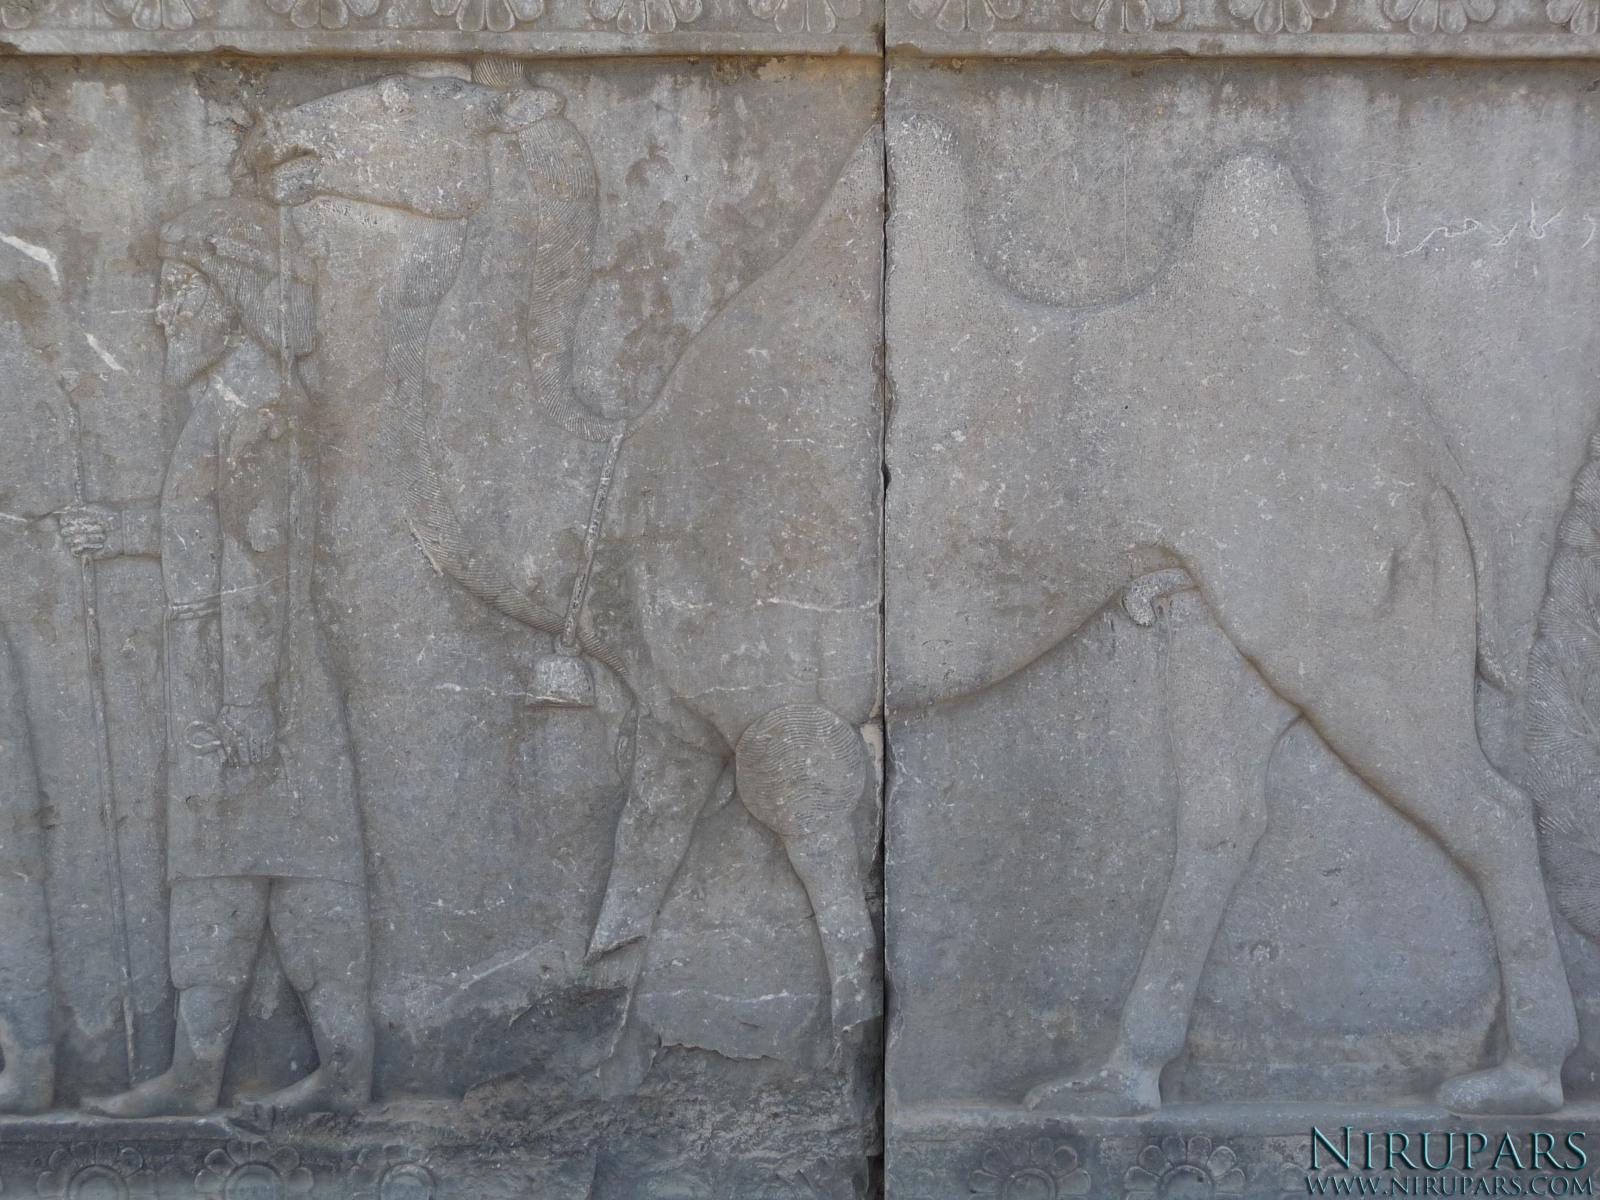 Persepolis - Apadana - North Portico - Delegation Drangiana Arachosia - Camel